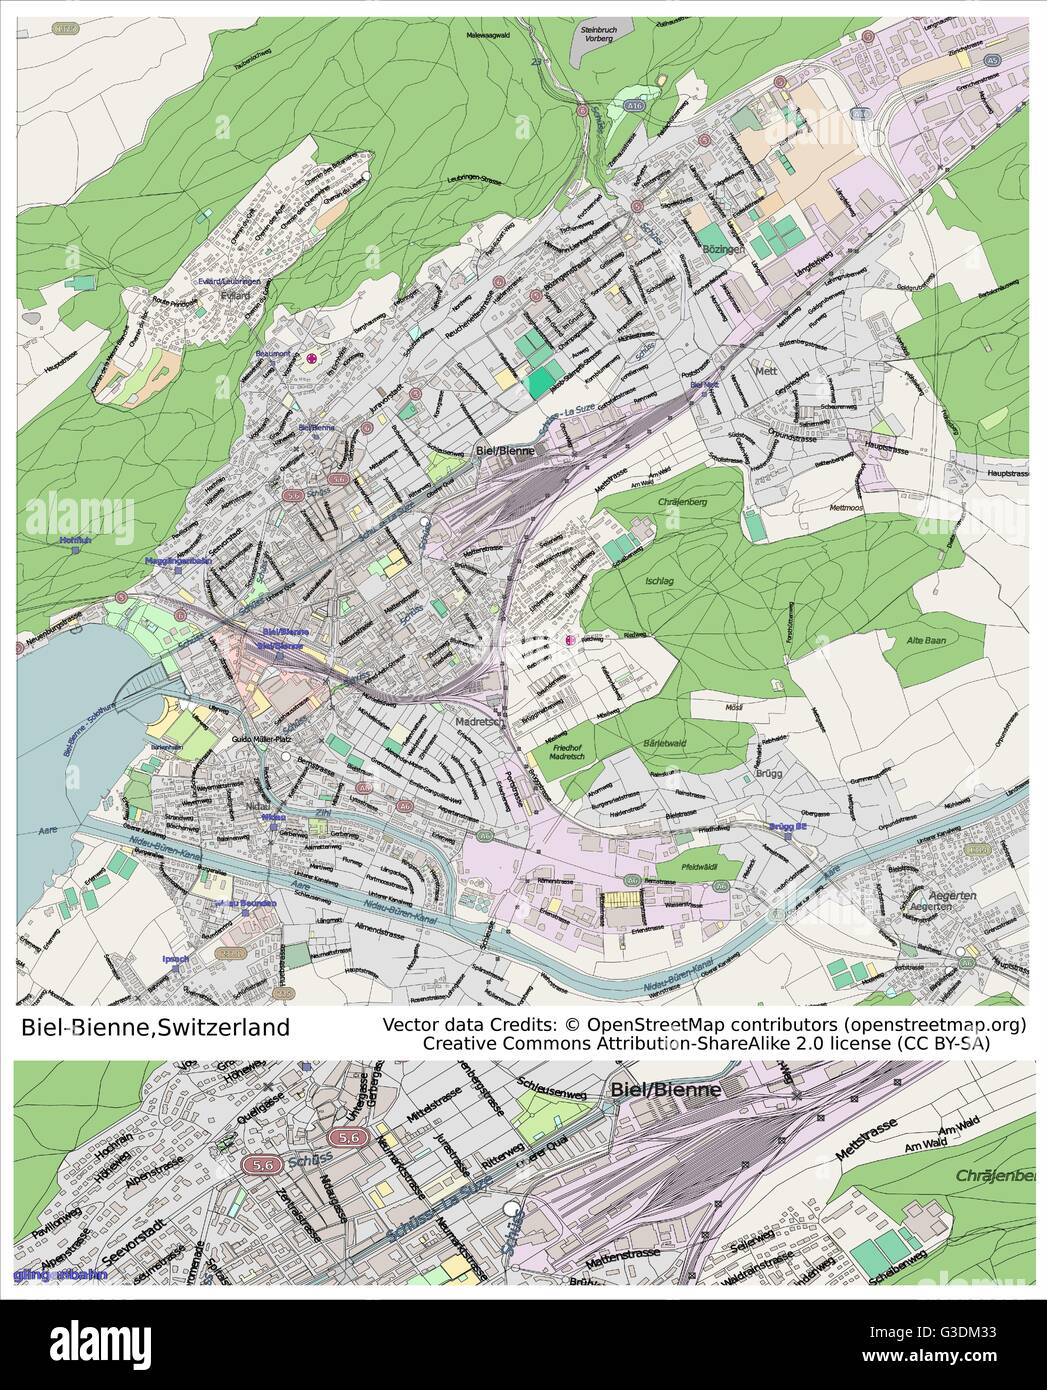 BielBienne Switzerland city map Stock Vector Art Illustration